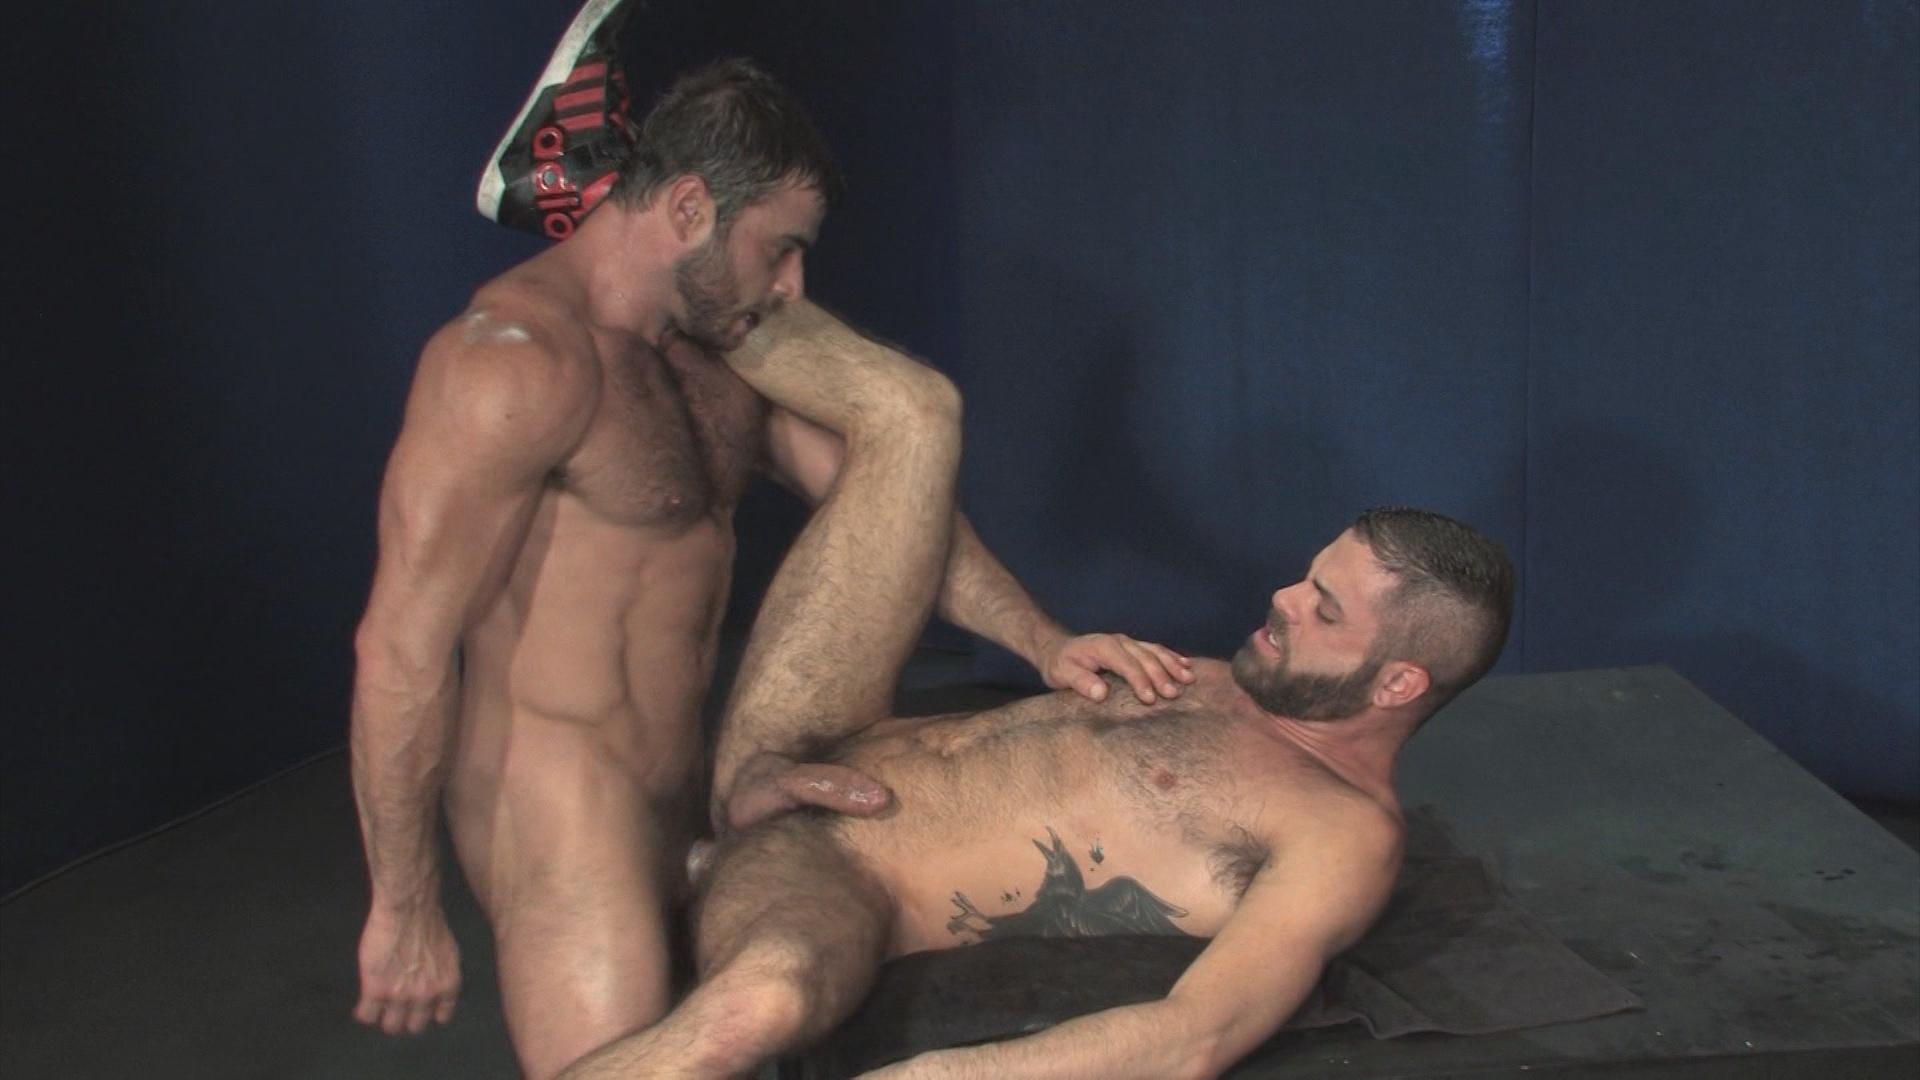 Relentless Xvideo gay